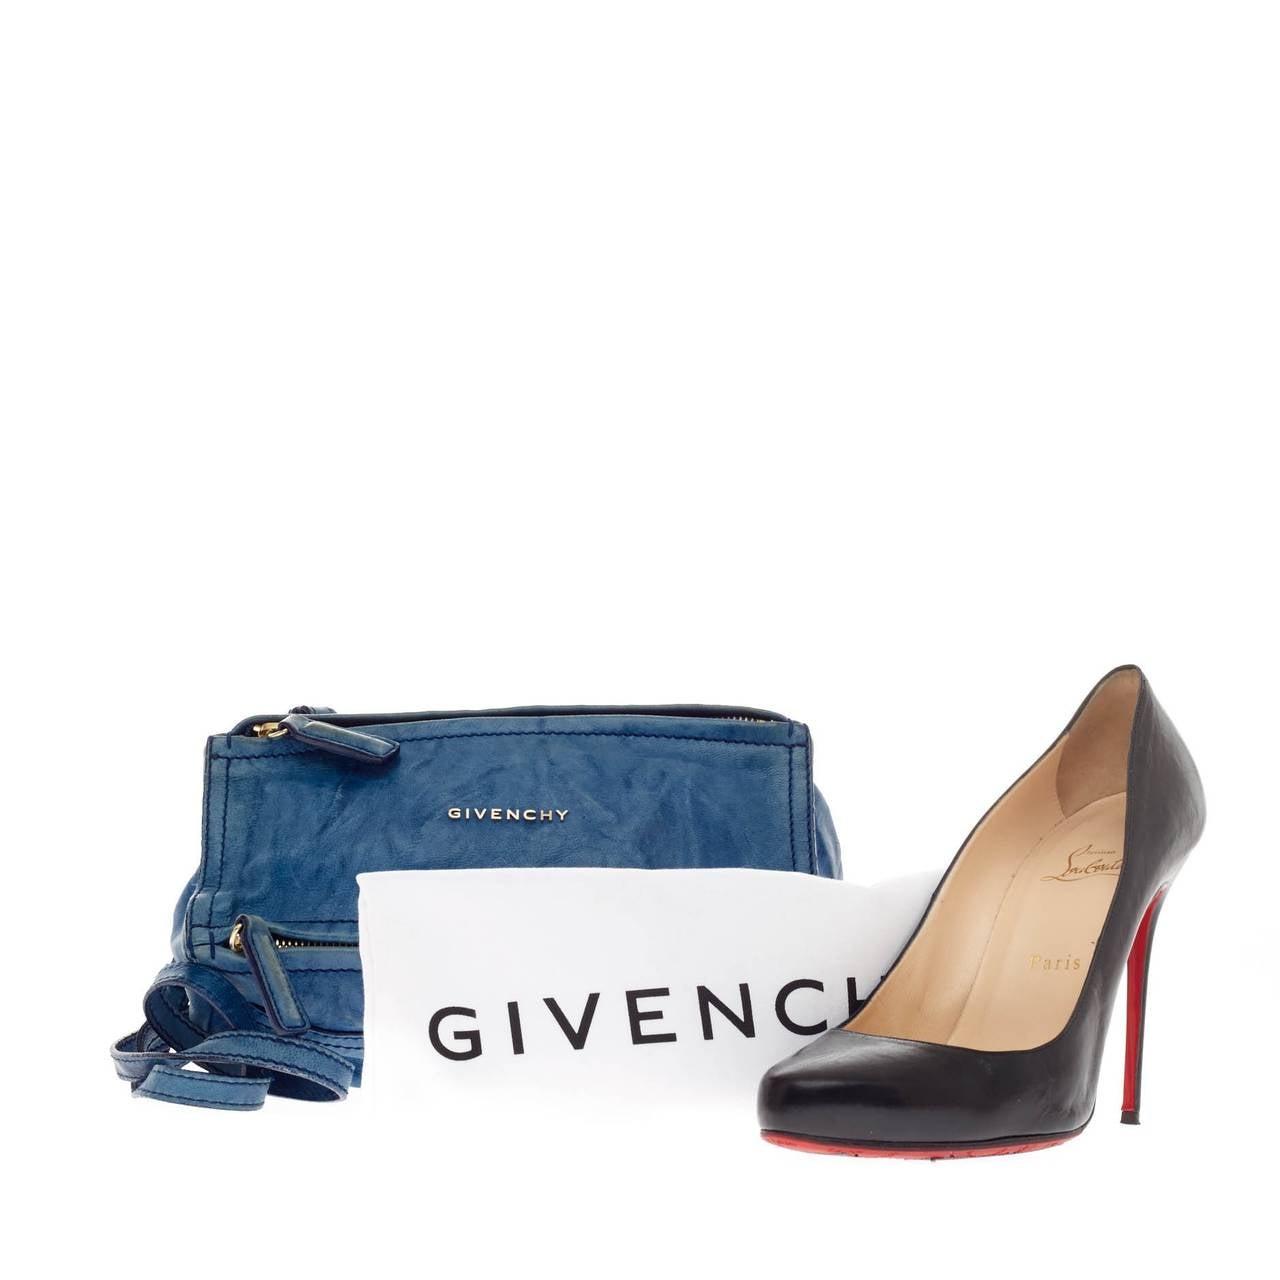 Givenchy Pandora Bag Leather Mini 2